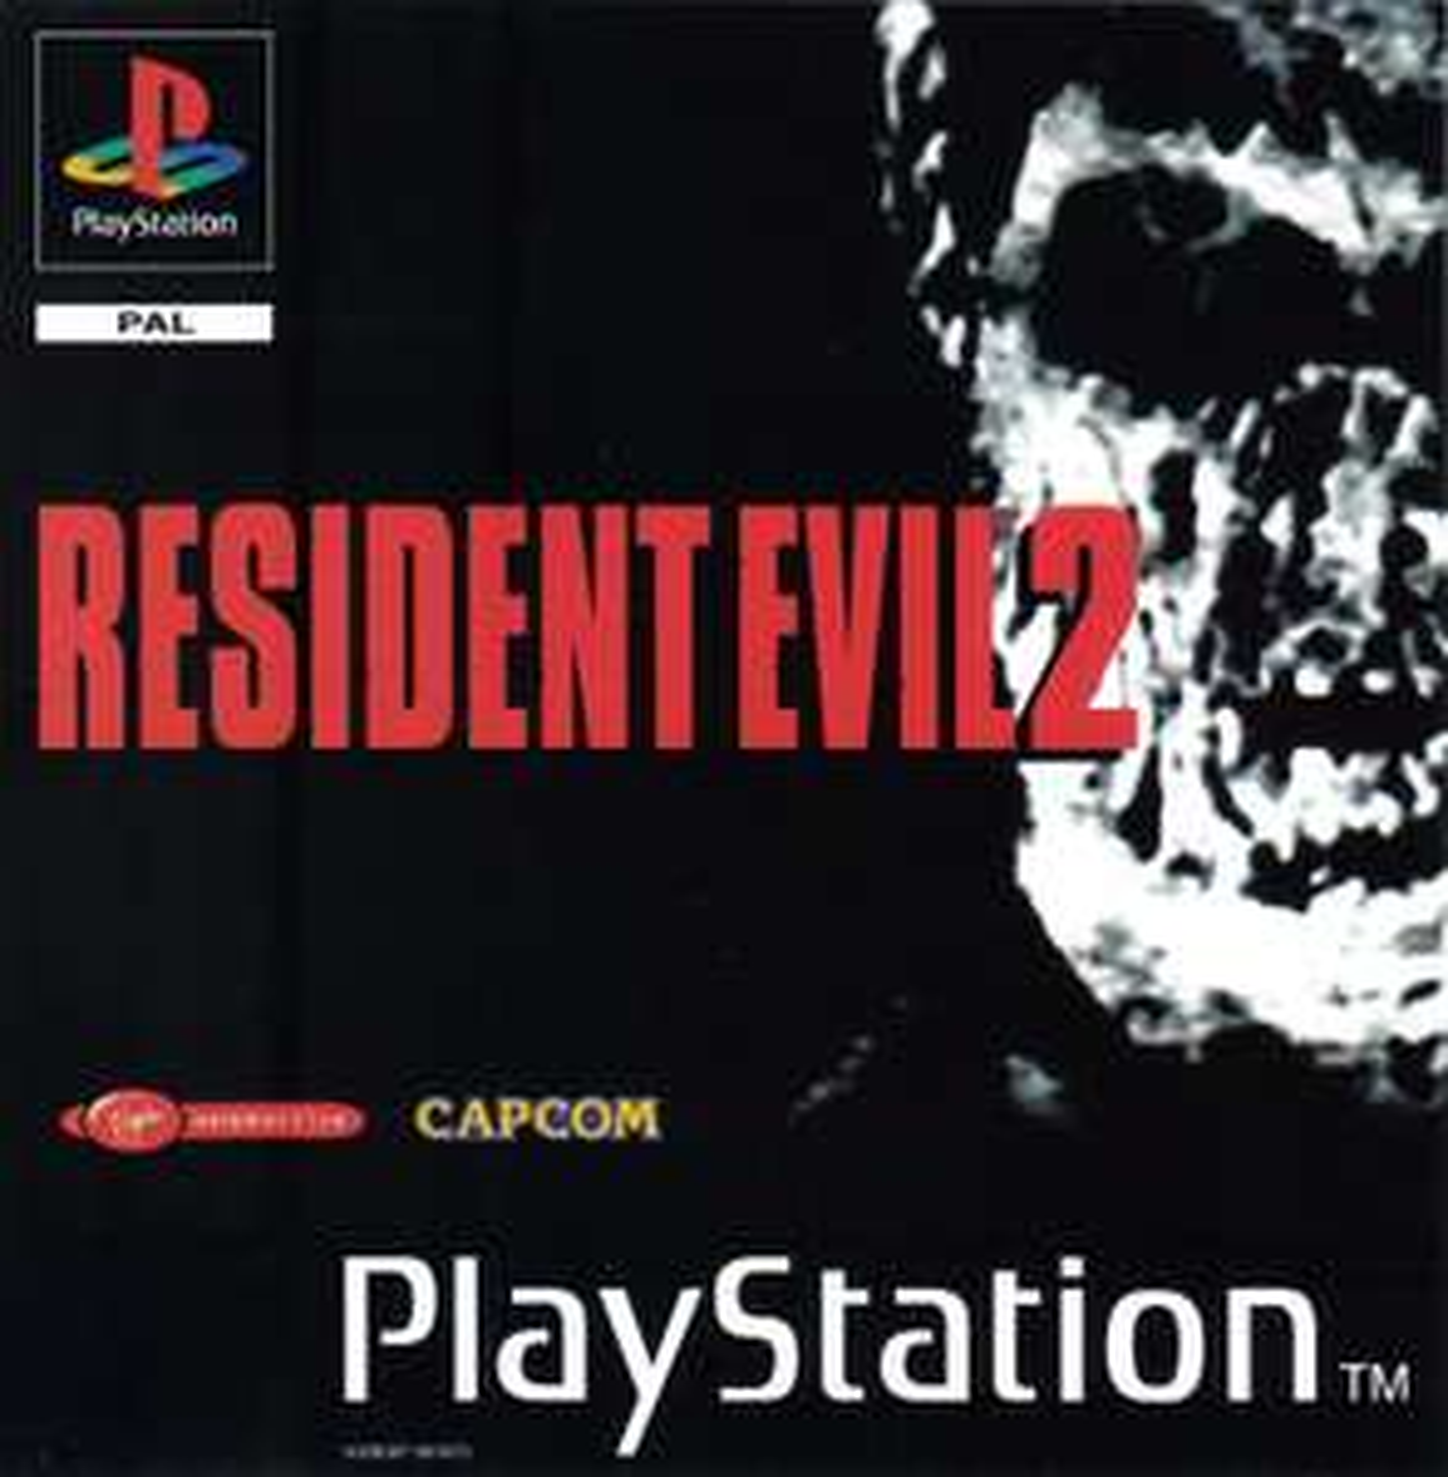 Resident Evil™ Super Bundle (10 Full Games) (1996-2012) PS3 - £11.99 on PSN